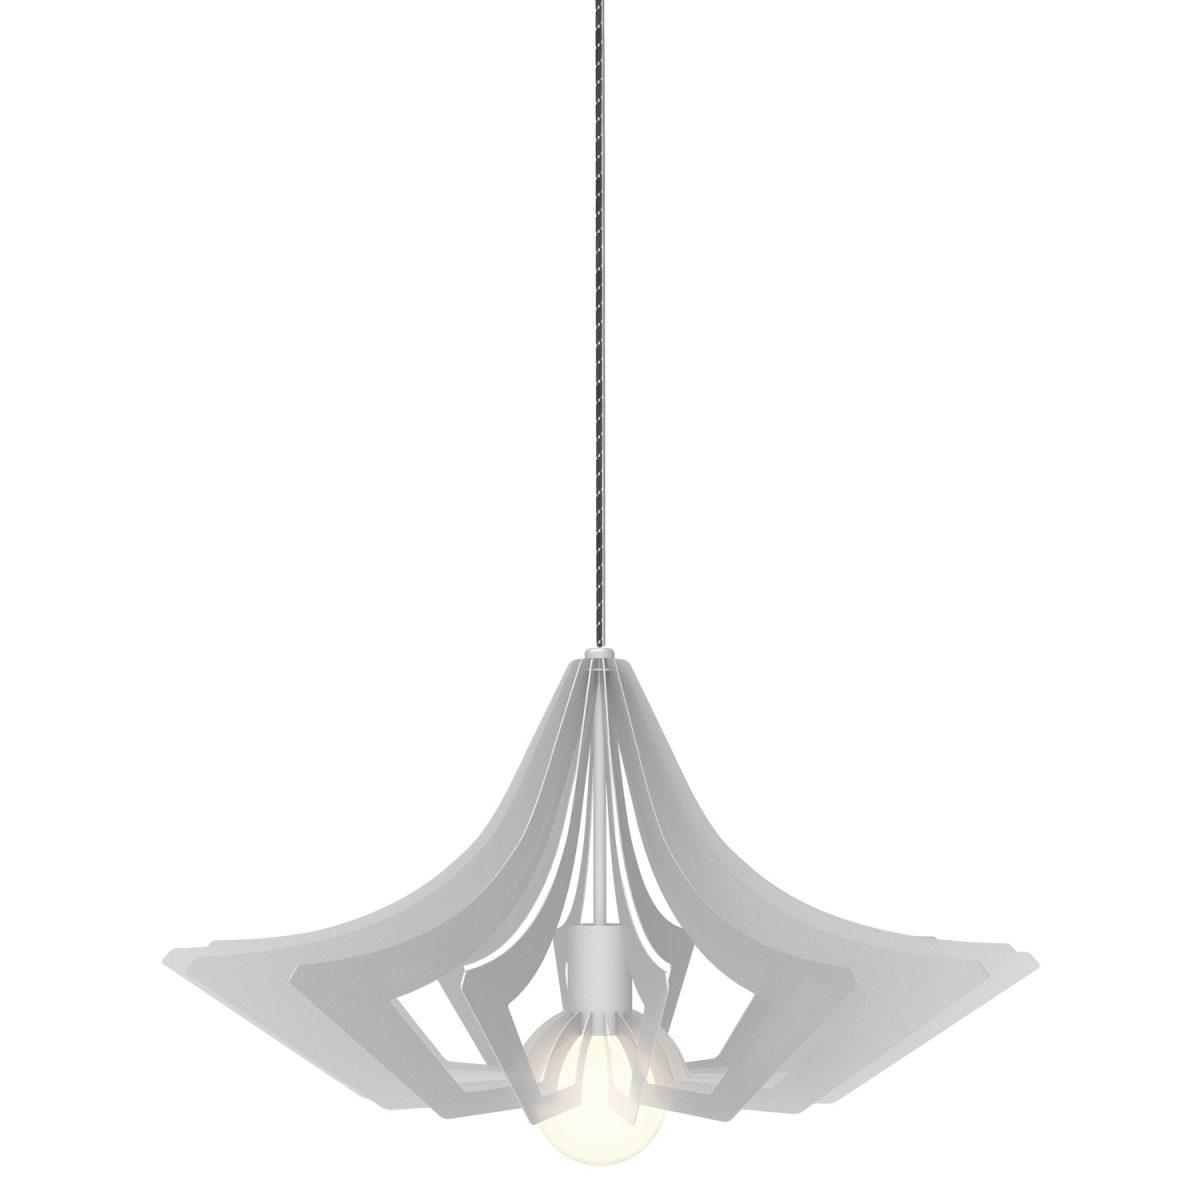 JSPR Beaudine II Silver Opaque Zilver Dutch Design Verlichting